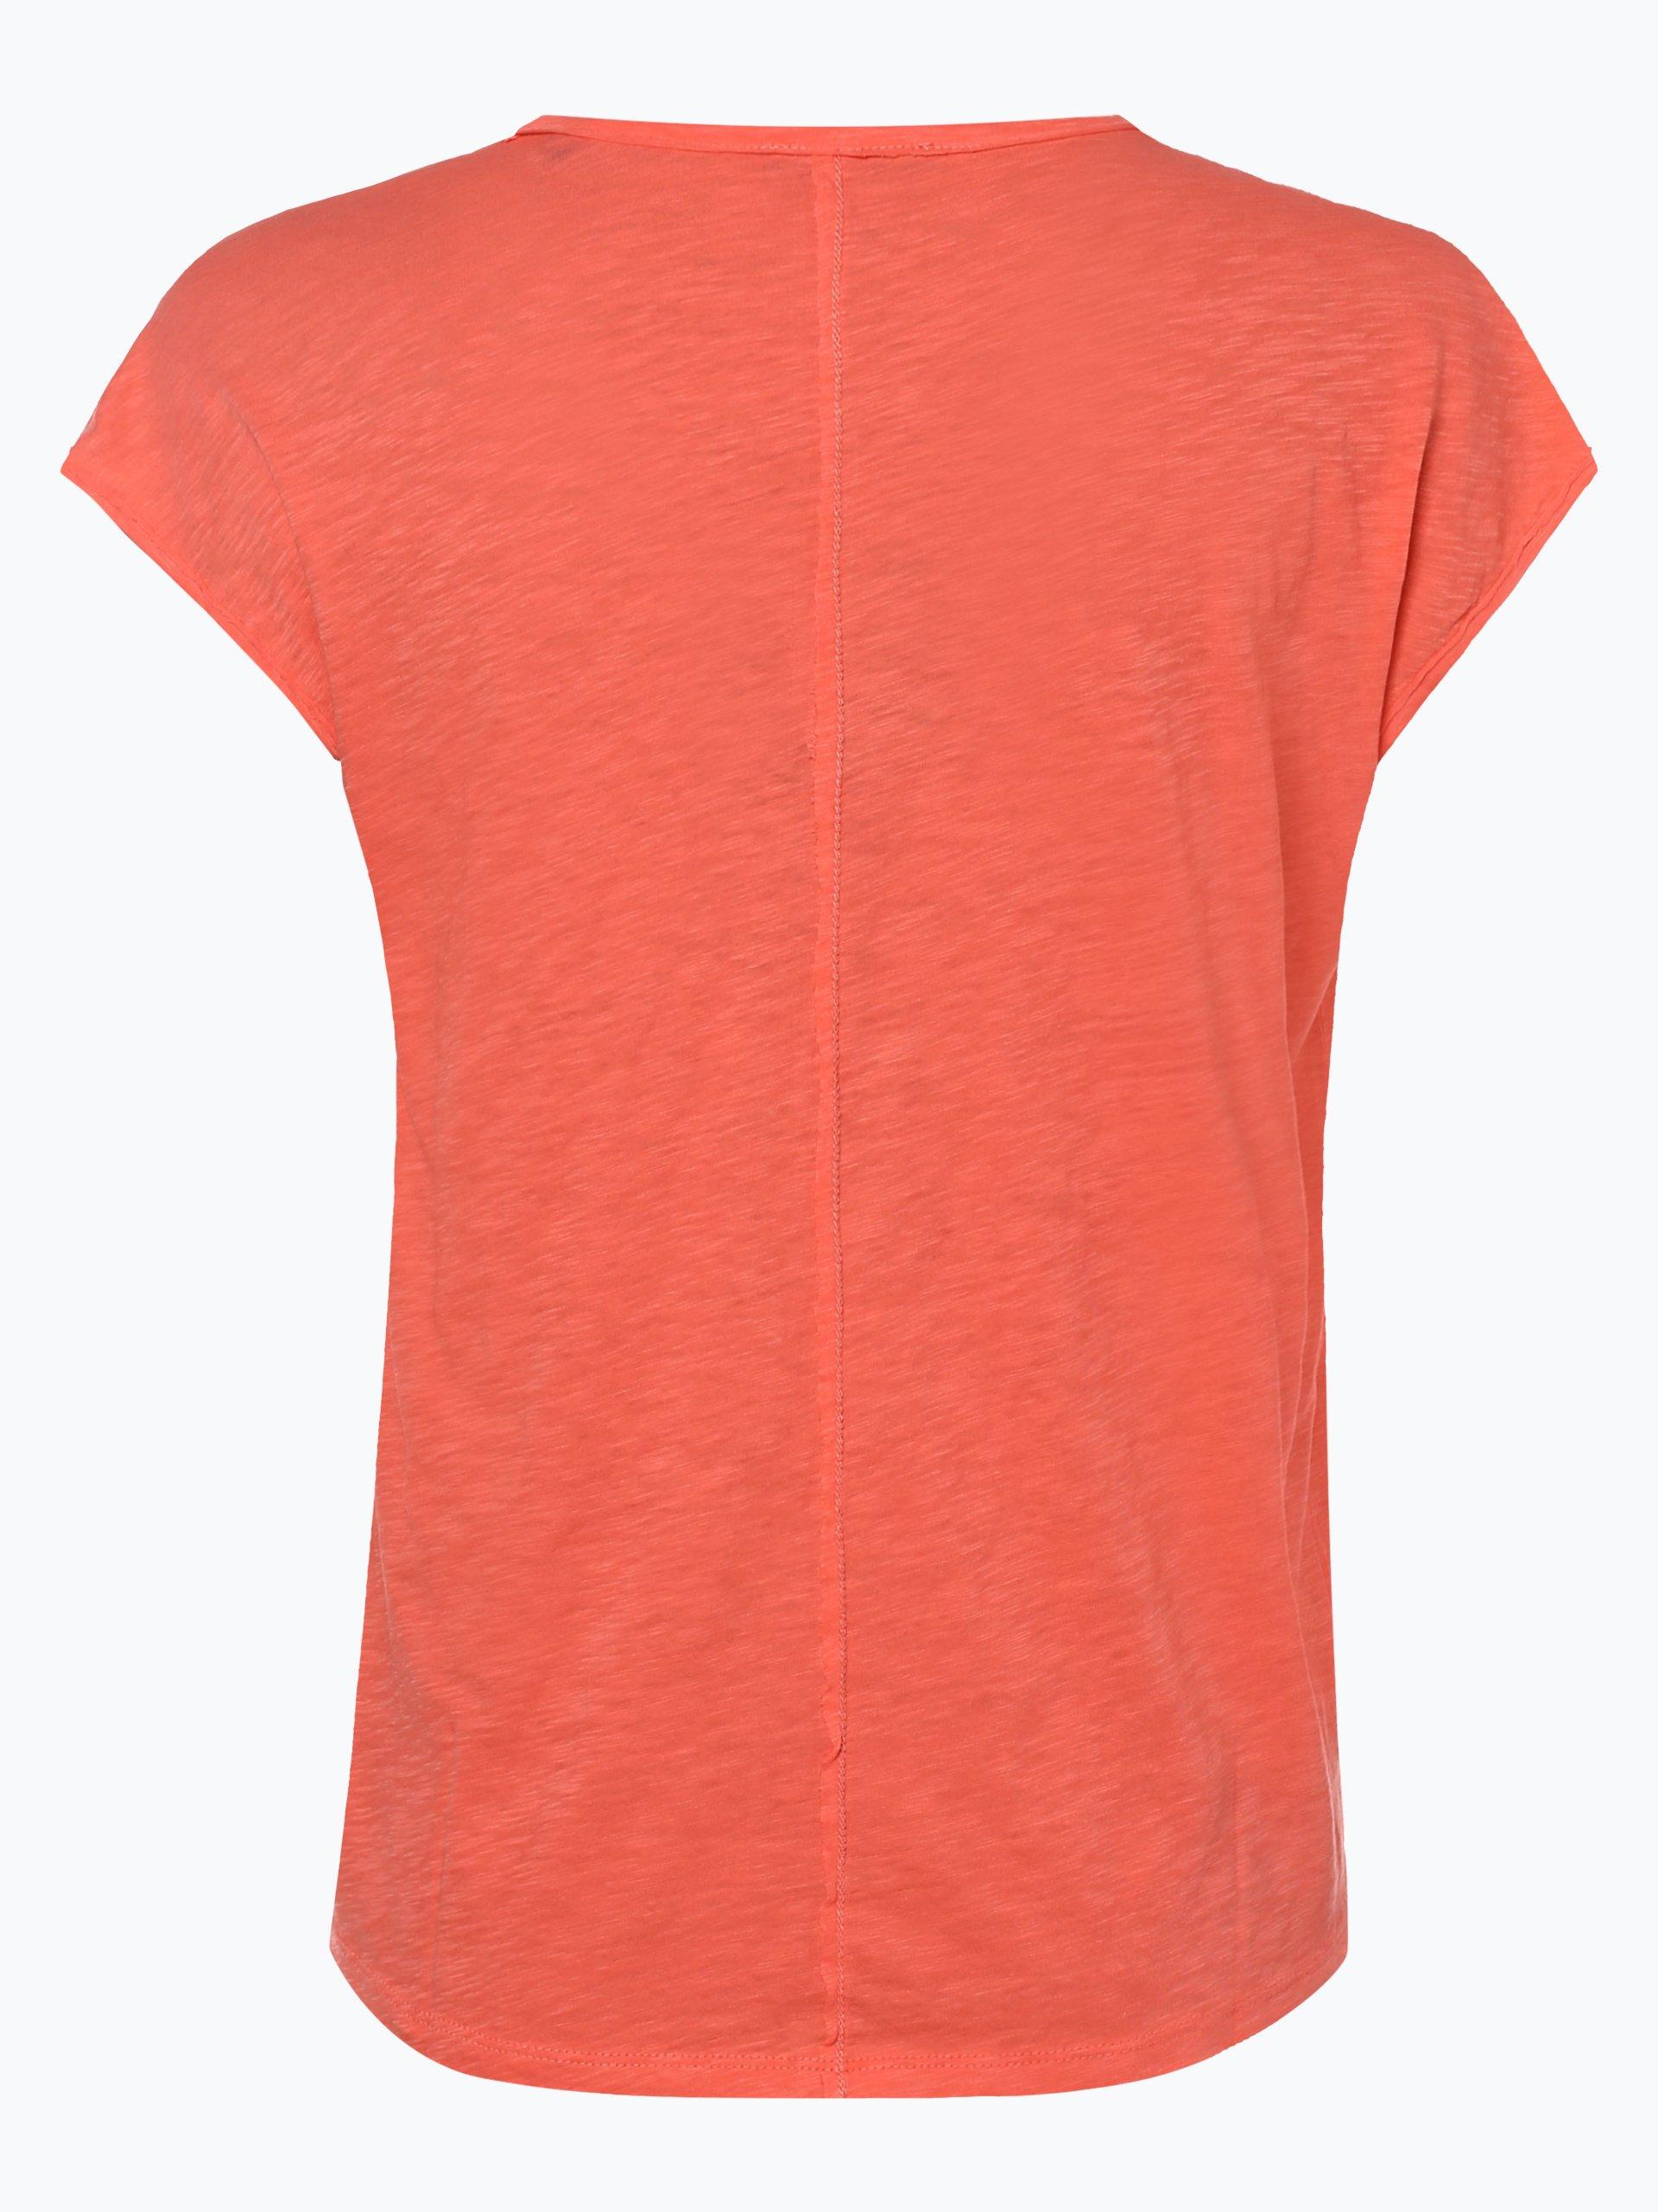 Marc O\'Polo Damen T-Shirt